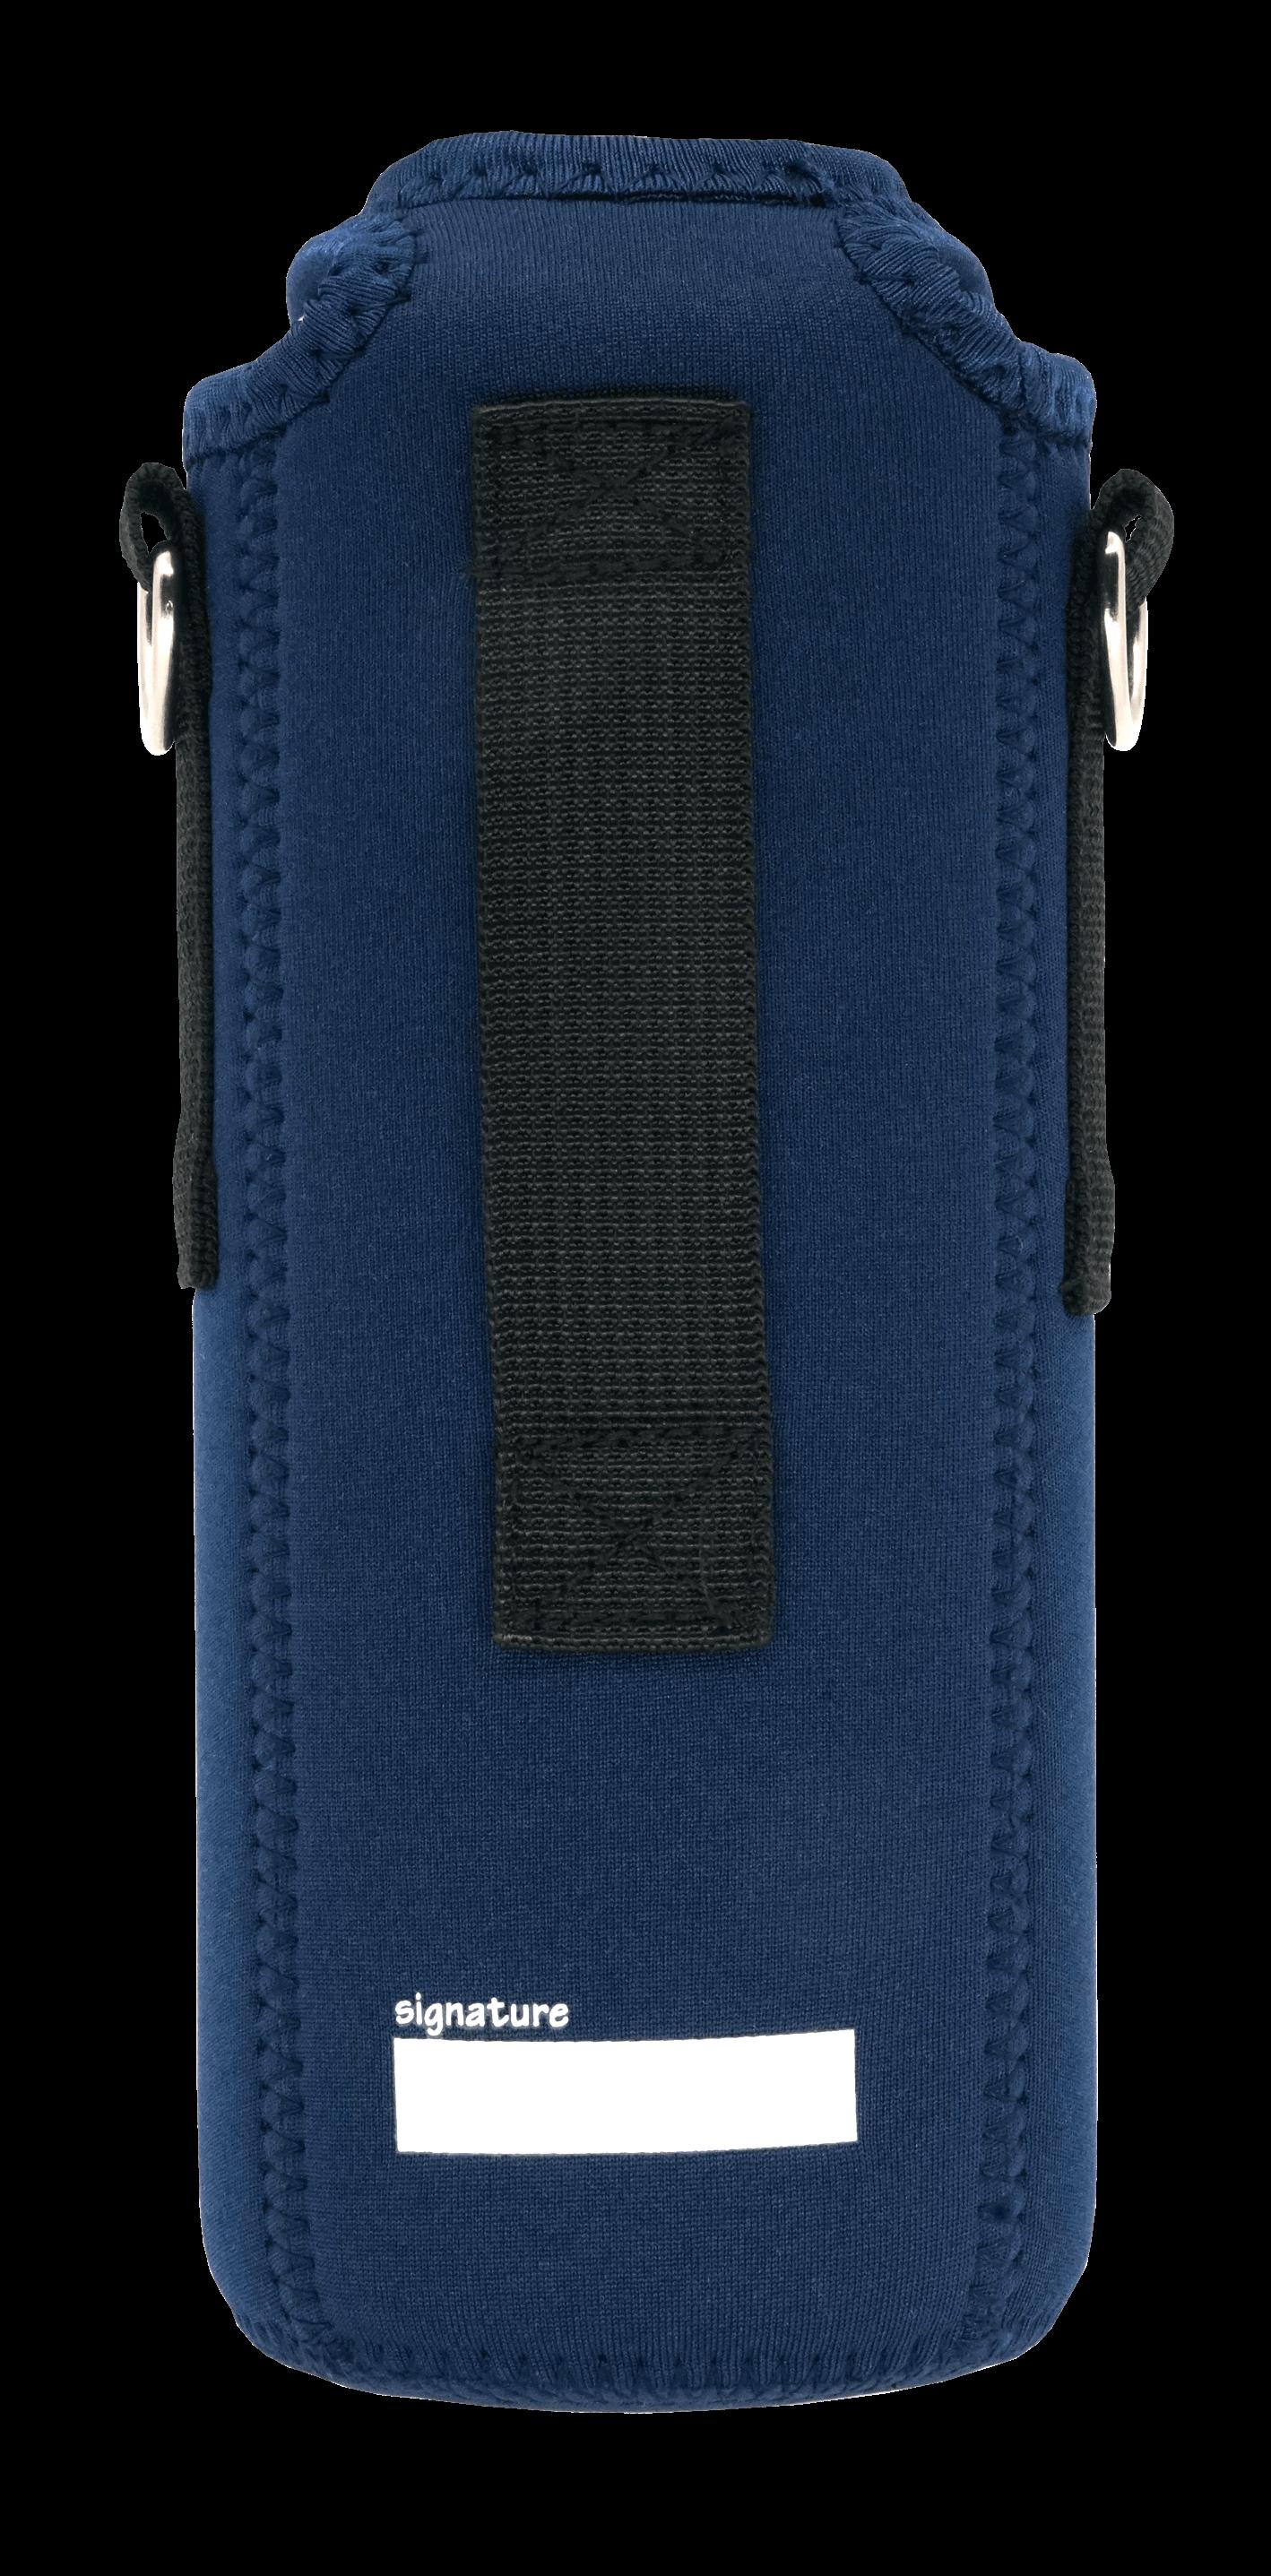 kooler cover strap